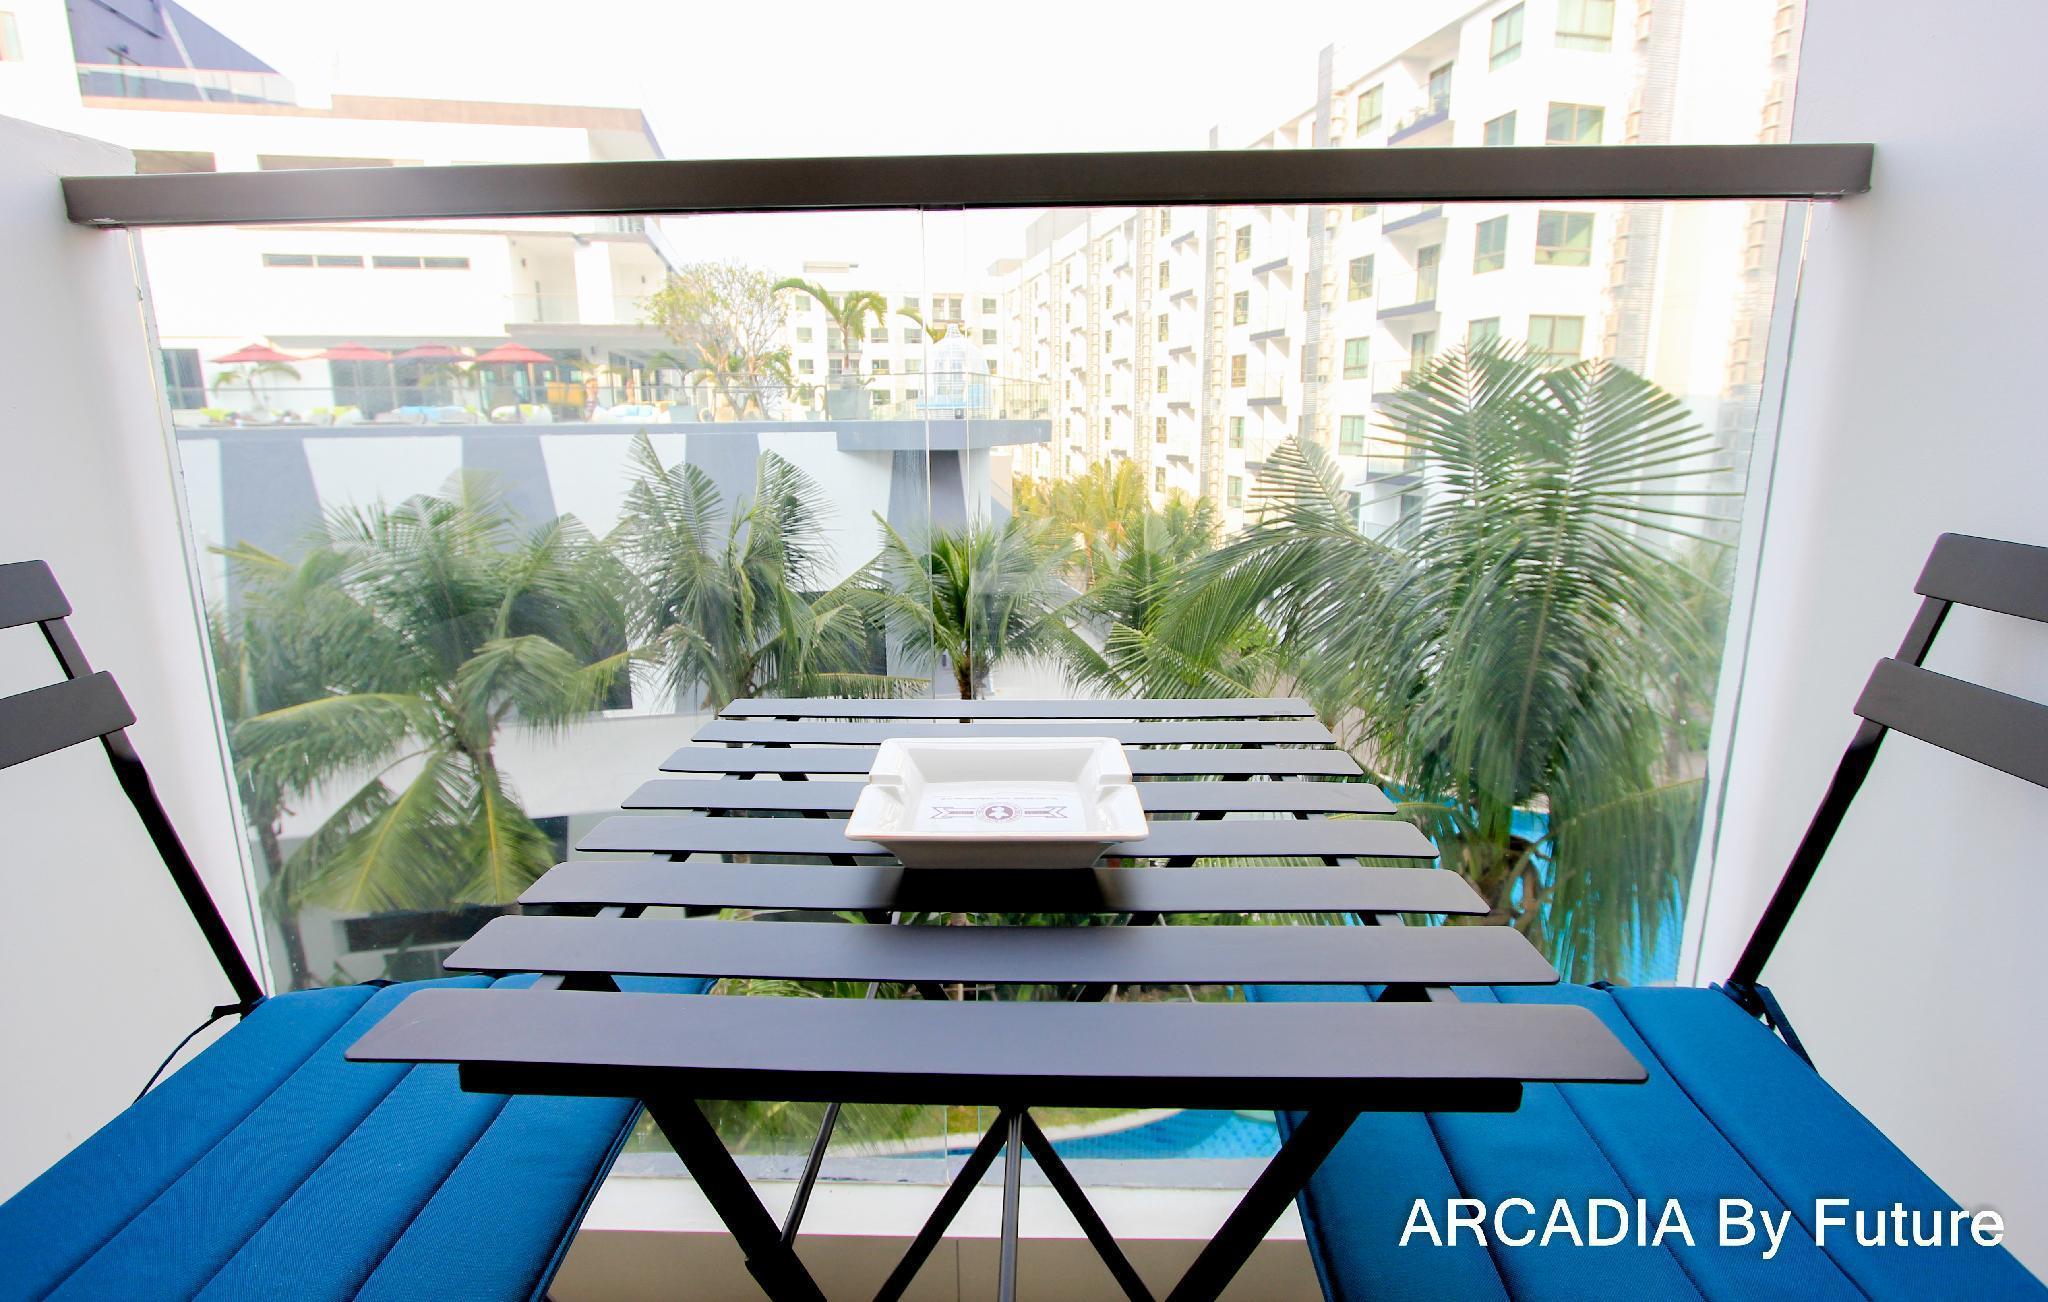 arcadia beach resort by future